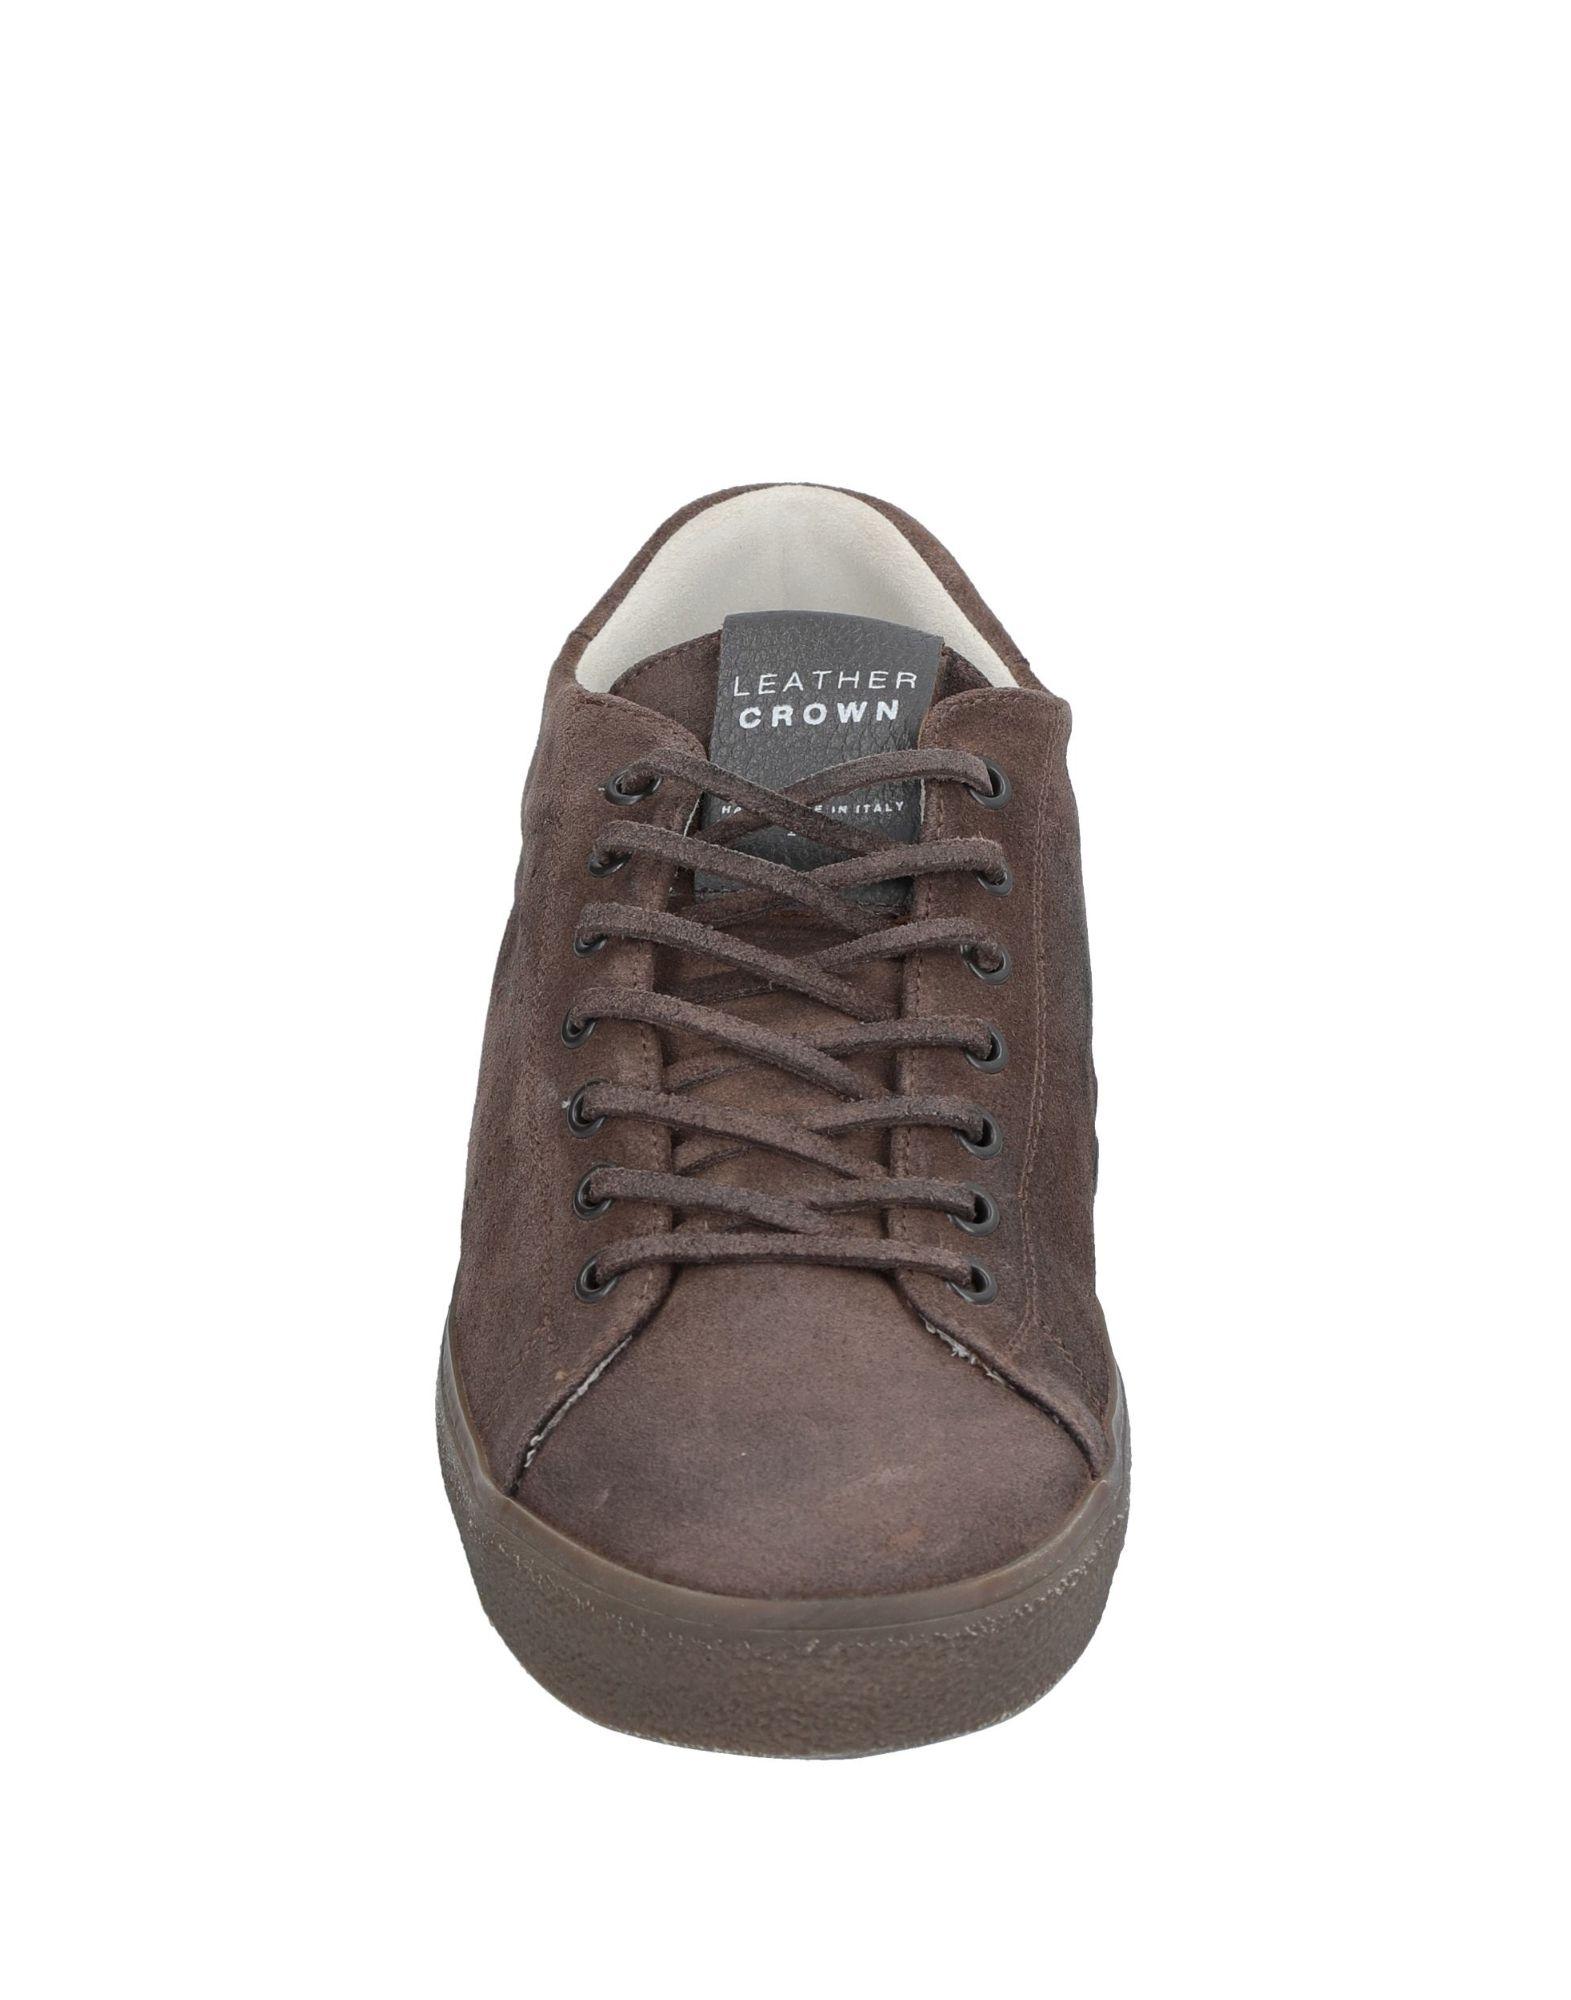 Leather 11532015EJ Crown Sneakers Herren  11532015EJ Leather c81e93